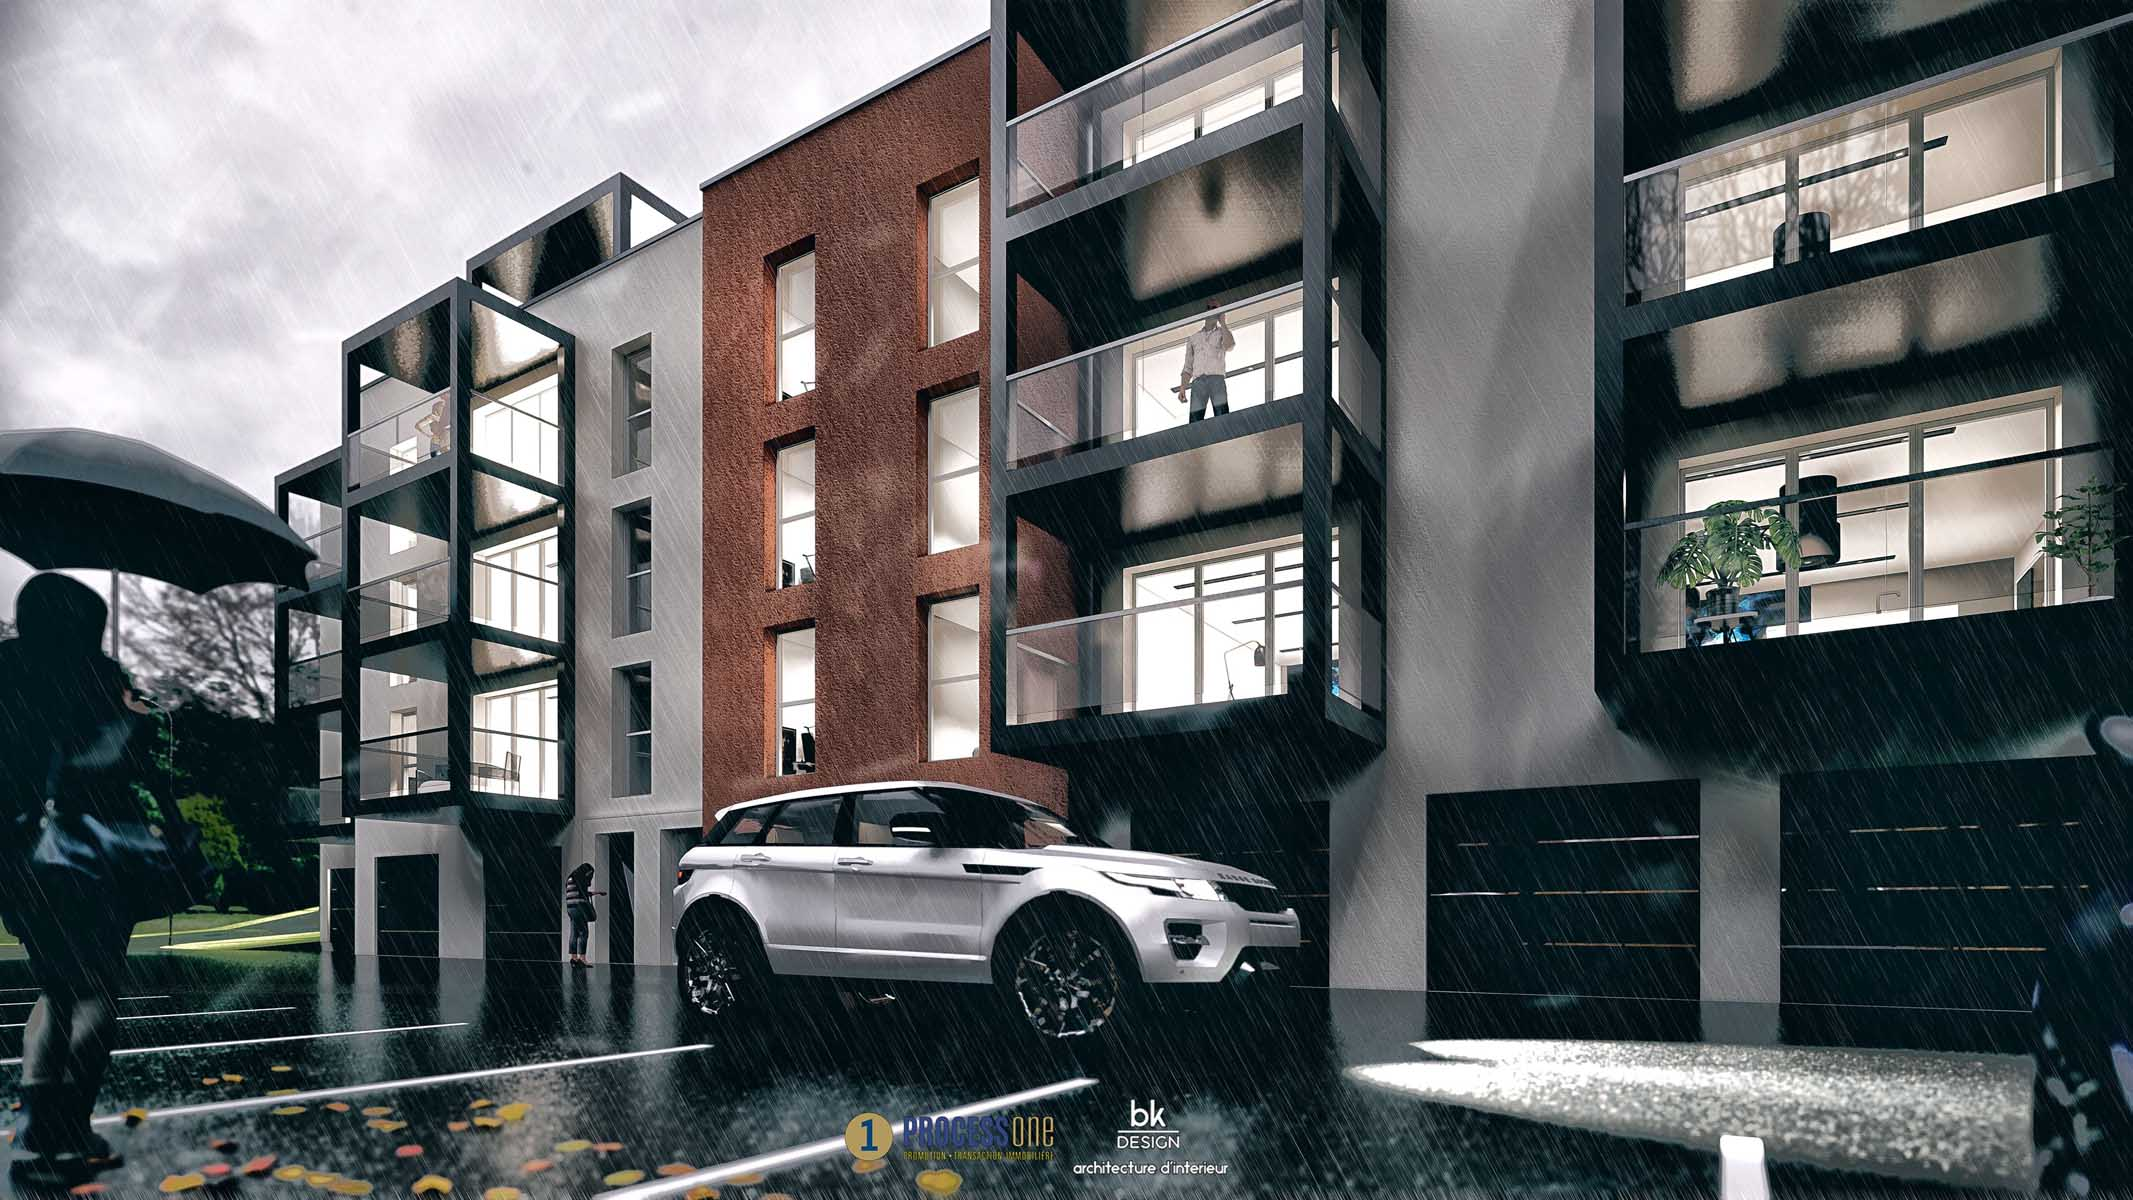 26 bk Design Projet Vesoul Immeuble v5 R04